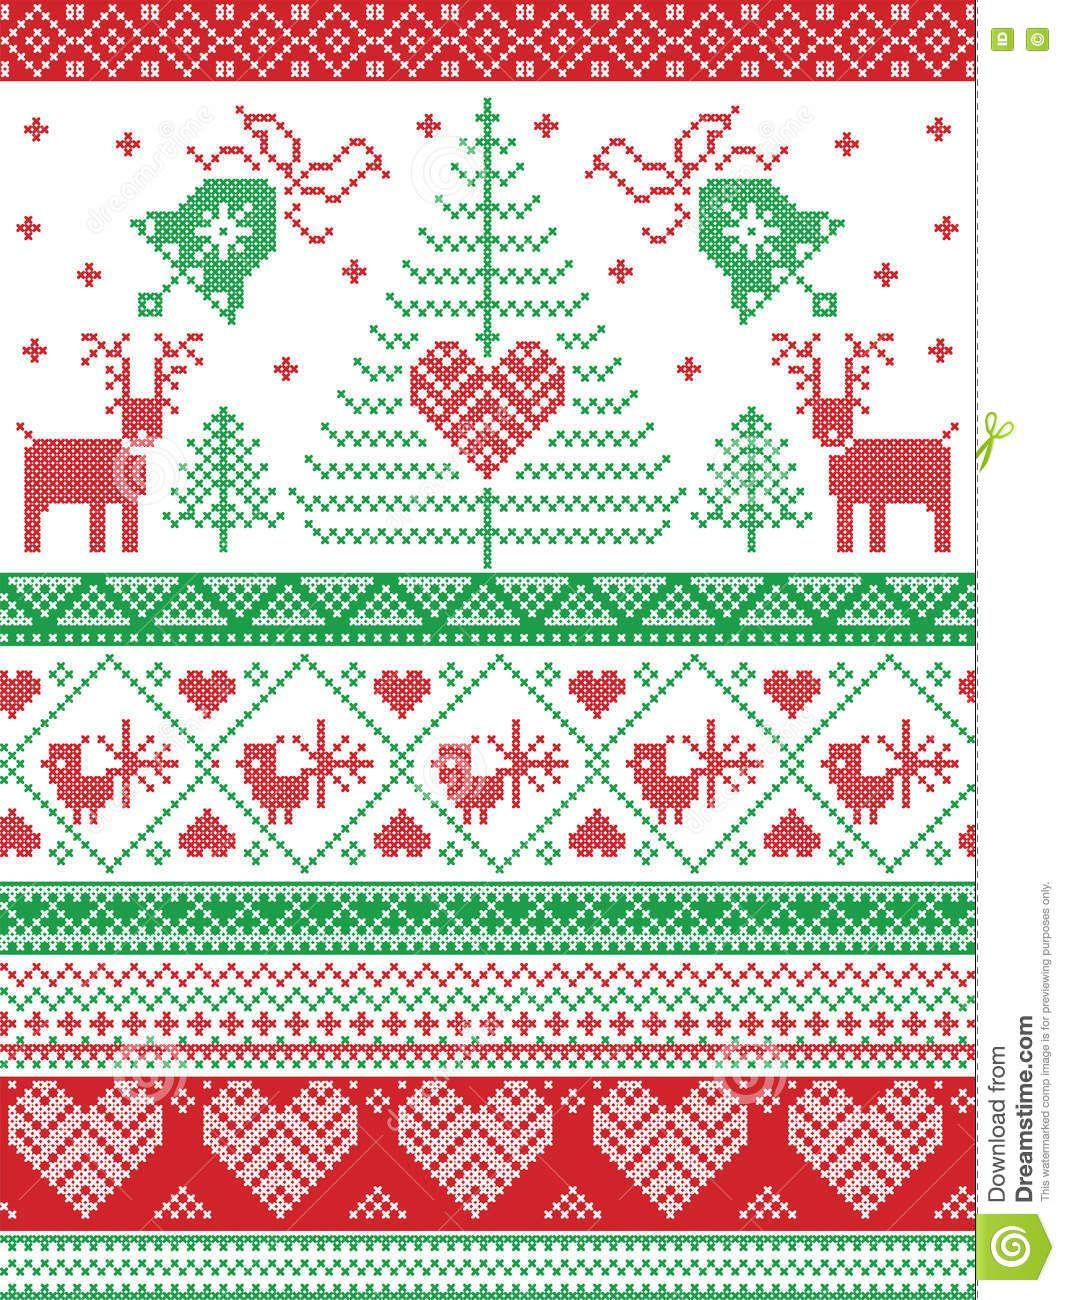 Scandinavian Style And Nordic Culture Inspired Christmas Festive Winter Seamless Pattern Scandinavian Cross Stitch Cross Stitch Stocking Russian Cross Stitch